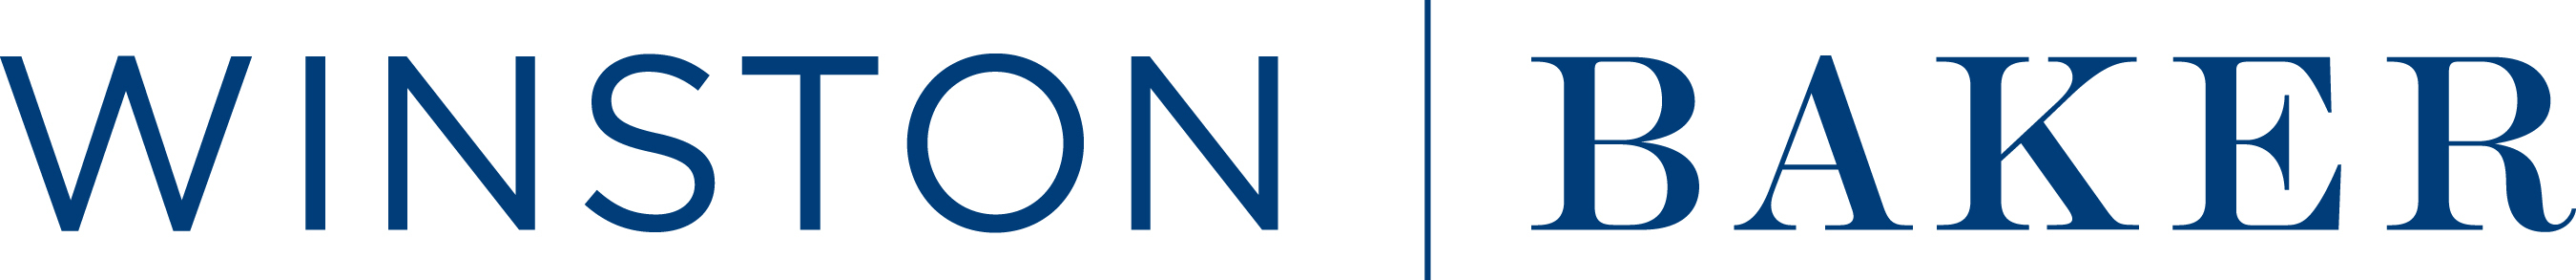 Winston Baker Logo (PRNewsFoto/Winston Baker)